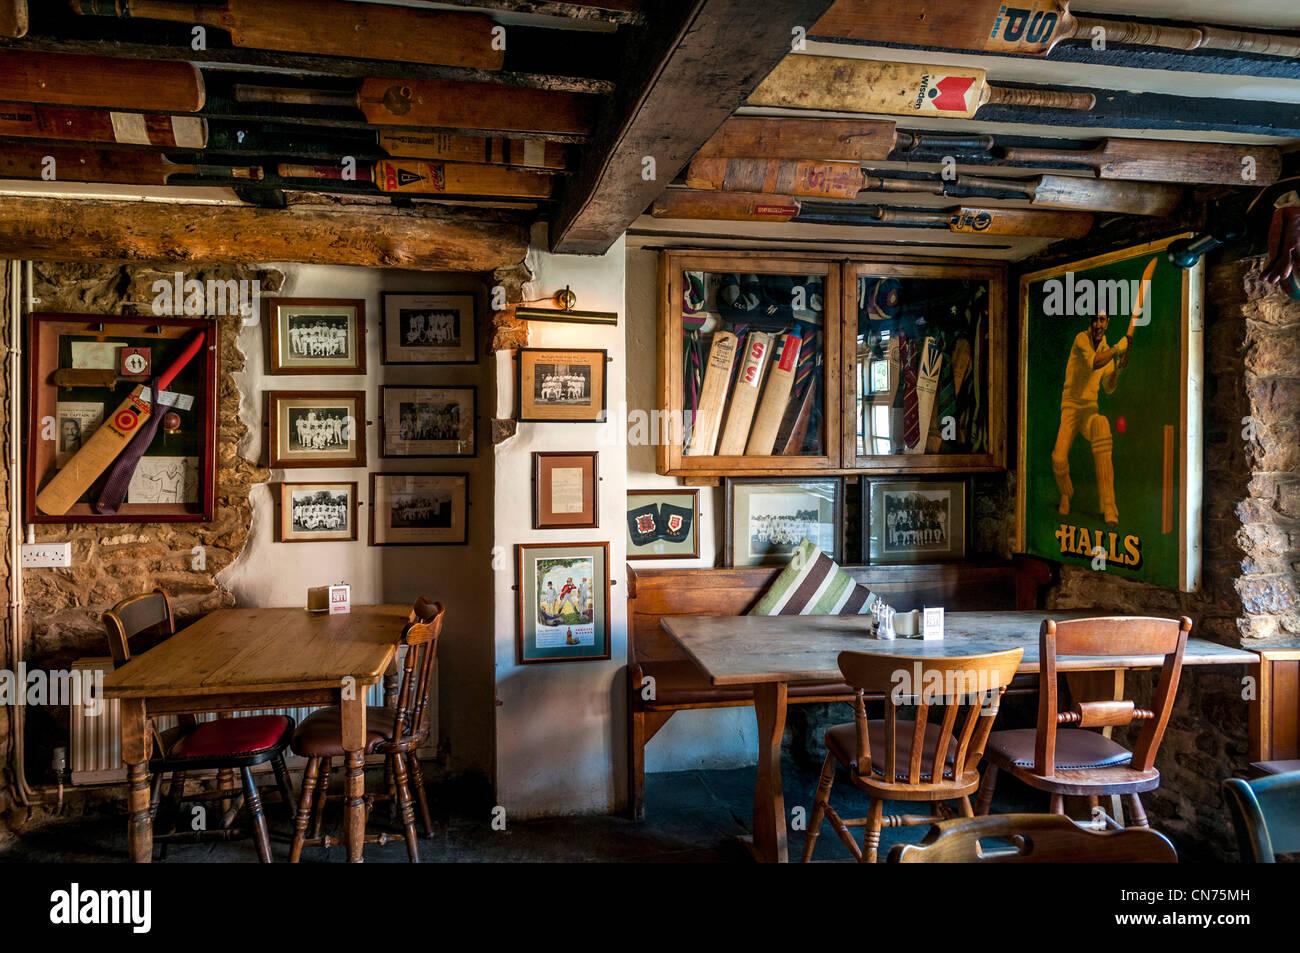 Village pub interior, UK - The Bat & Ball Inn, Cuddesdon, Oxford, UK - Stock Image